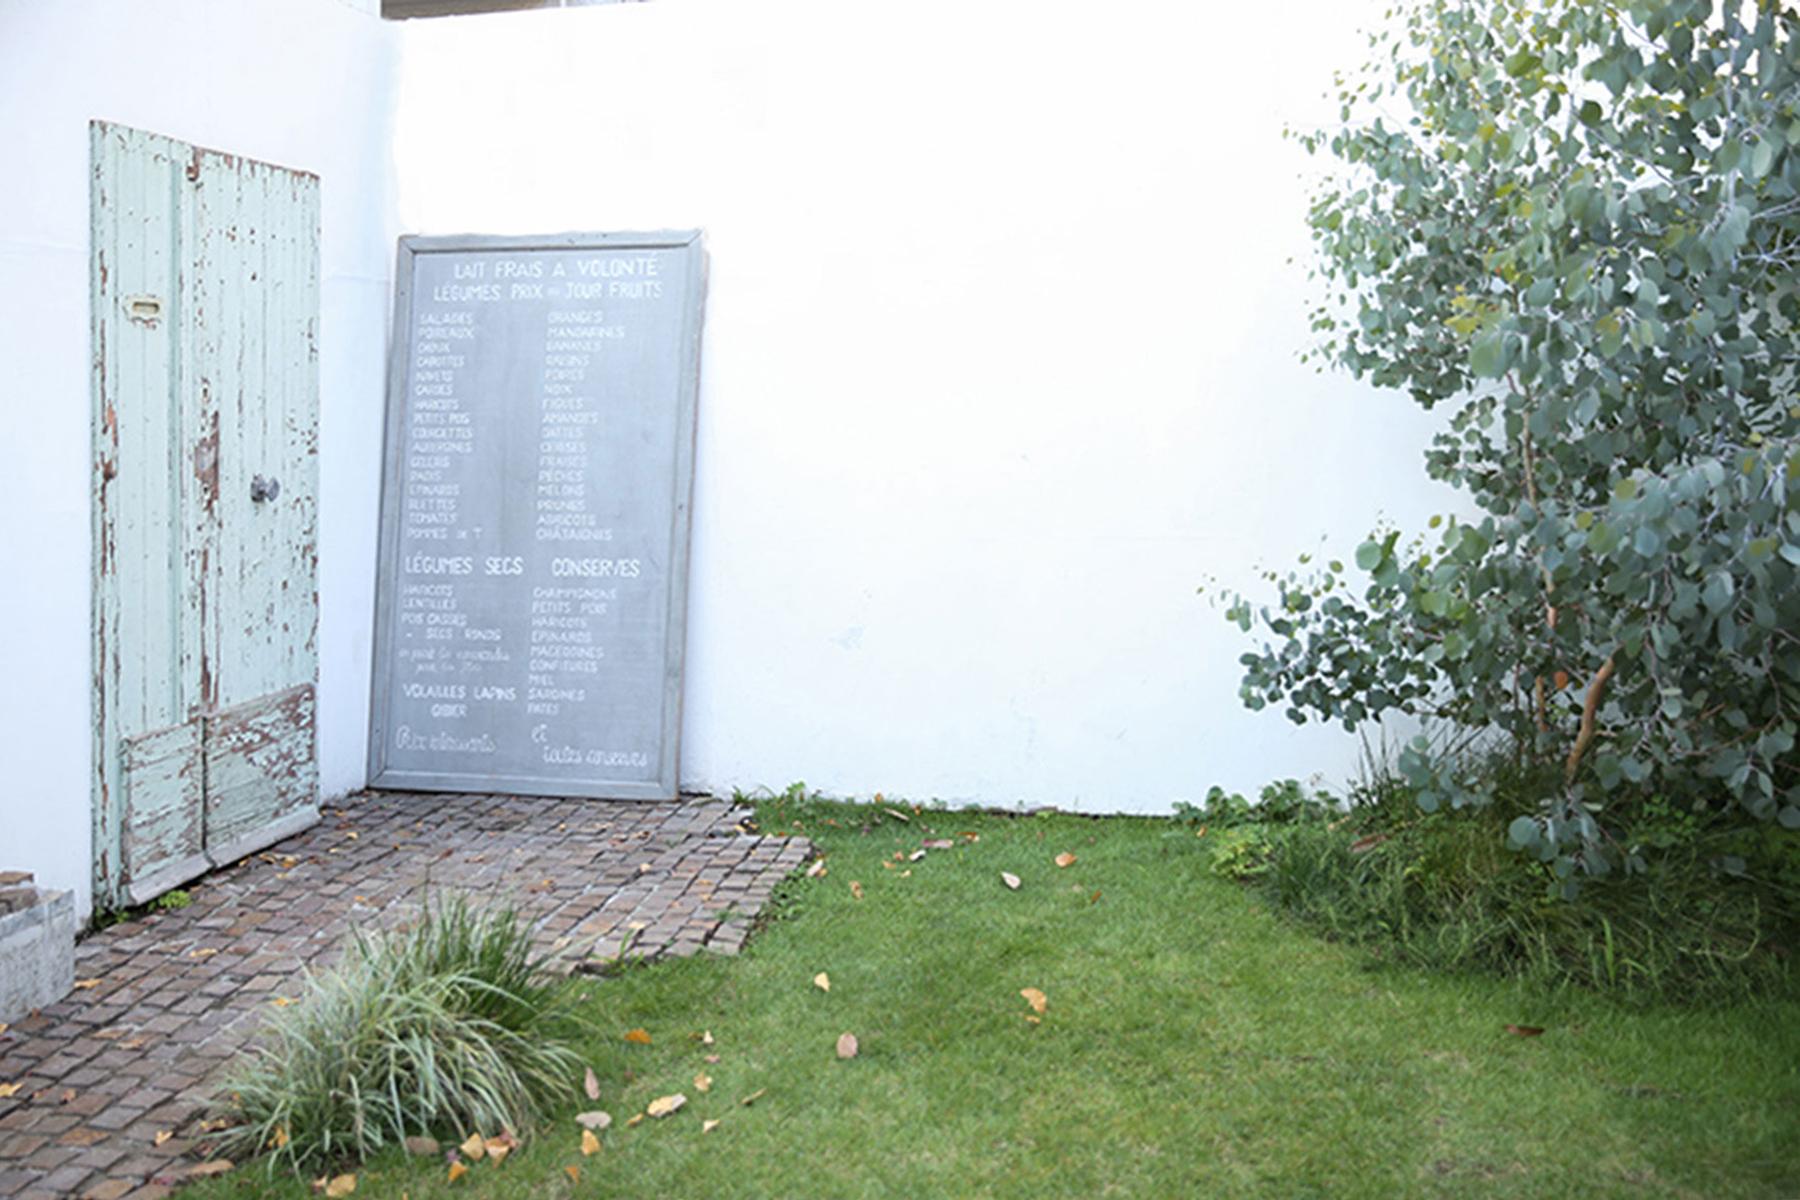 studio douz(ドゥーズ)目黒碑文谷光の差し込む側道